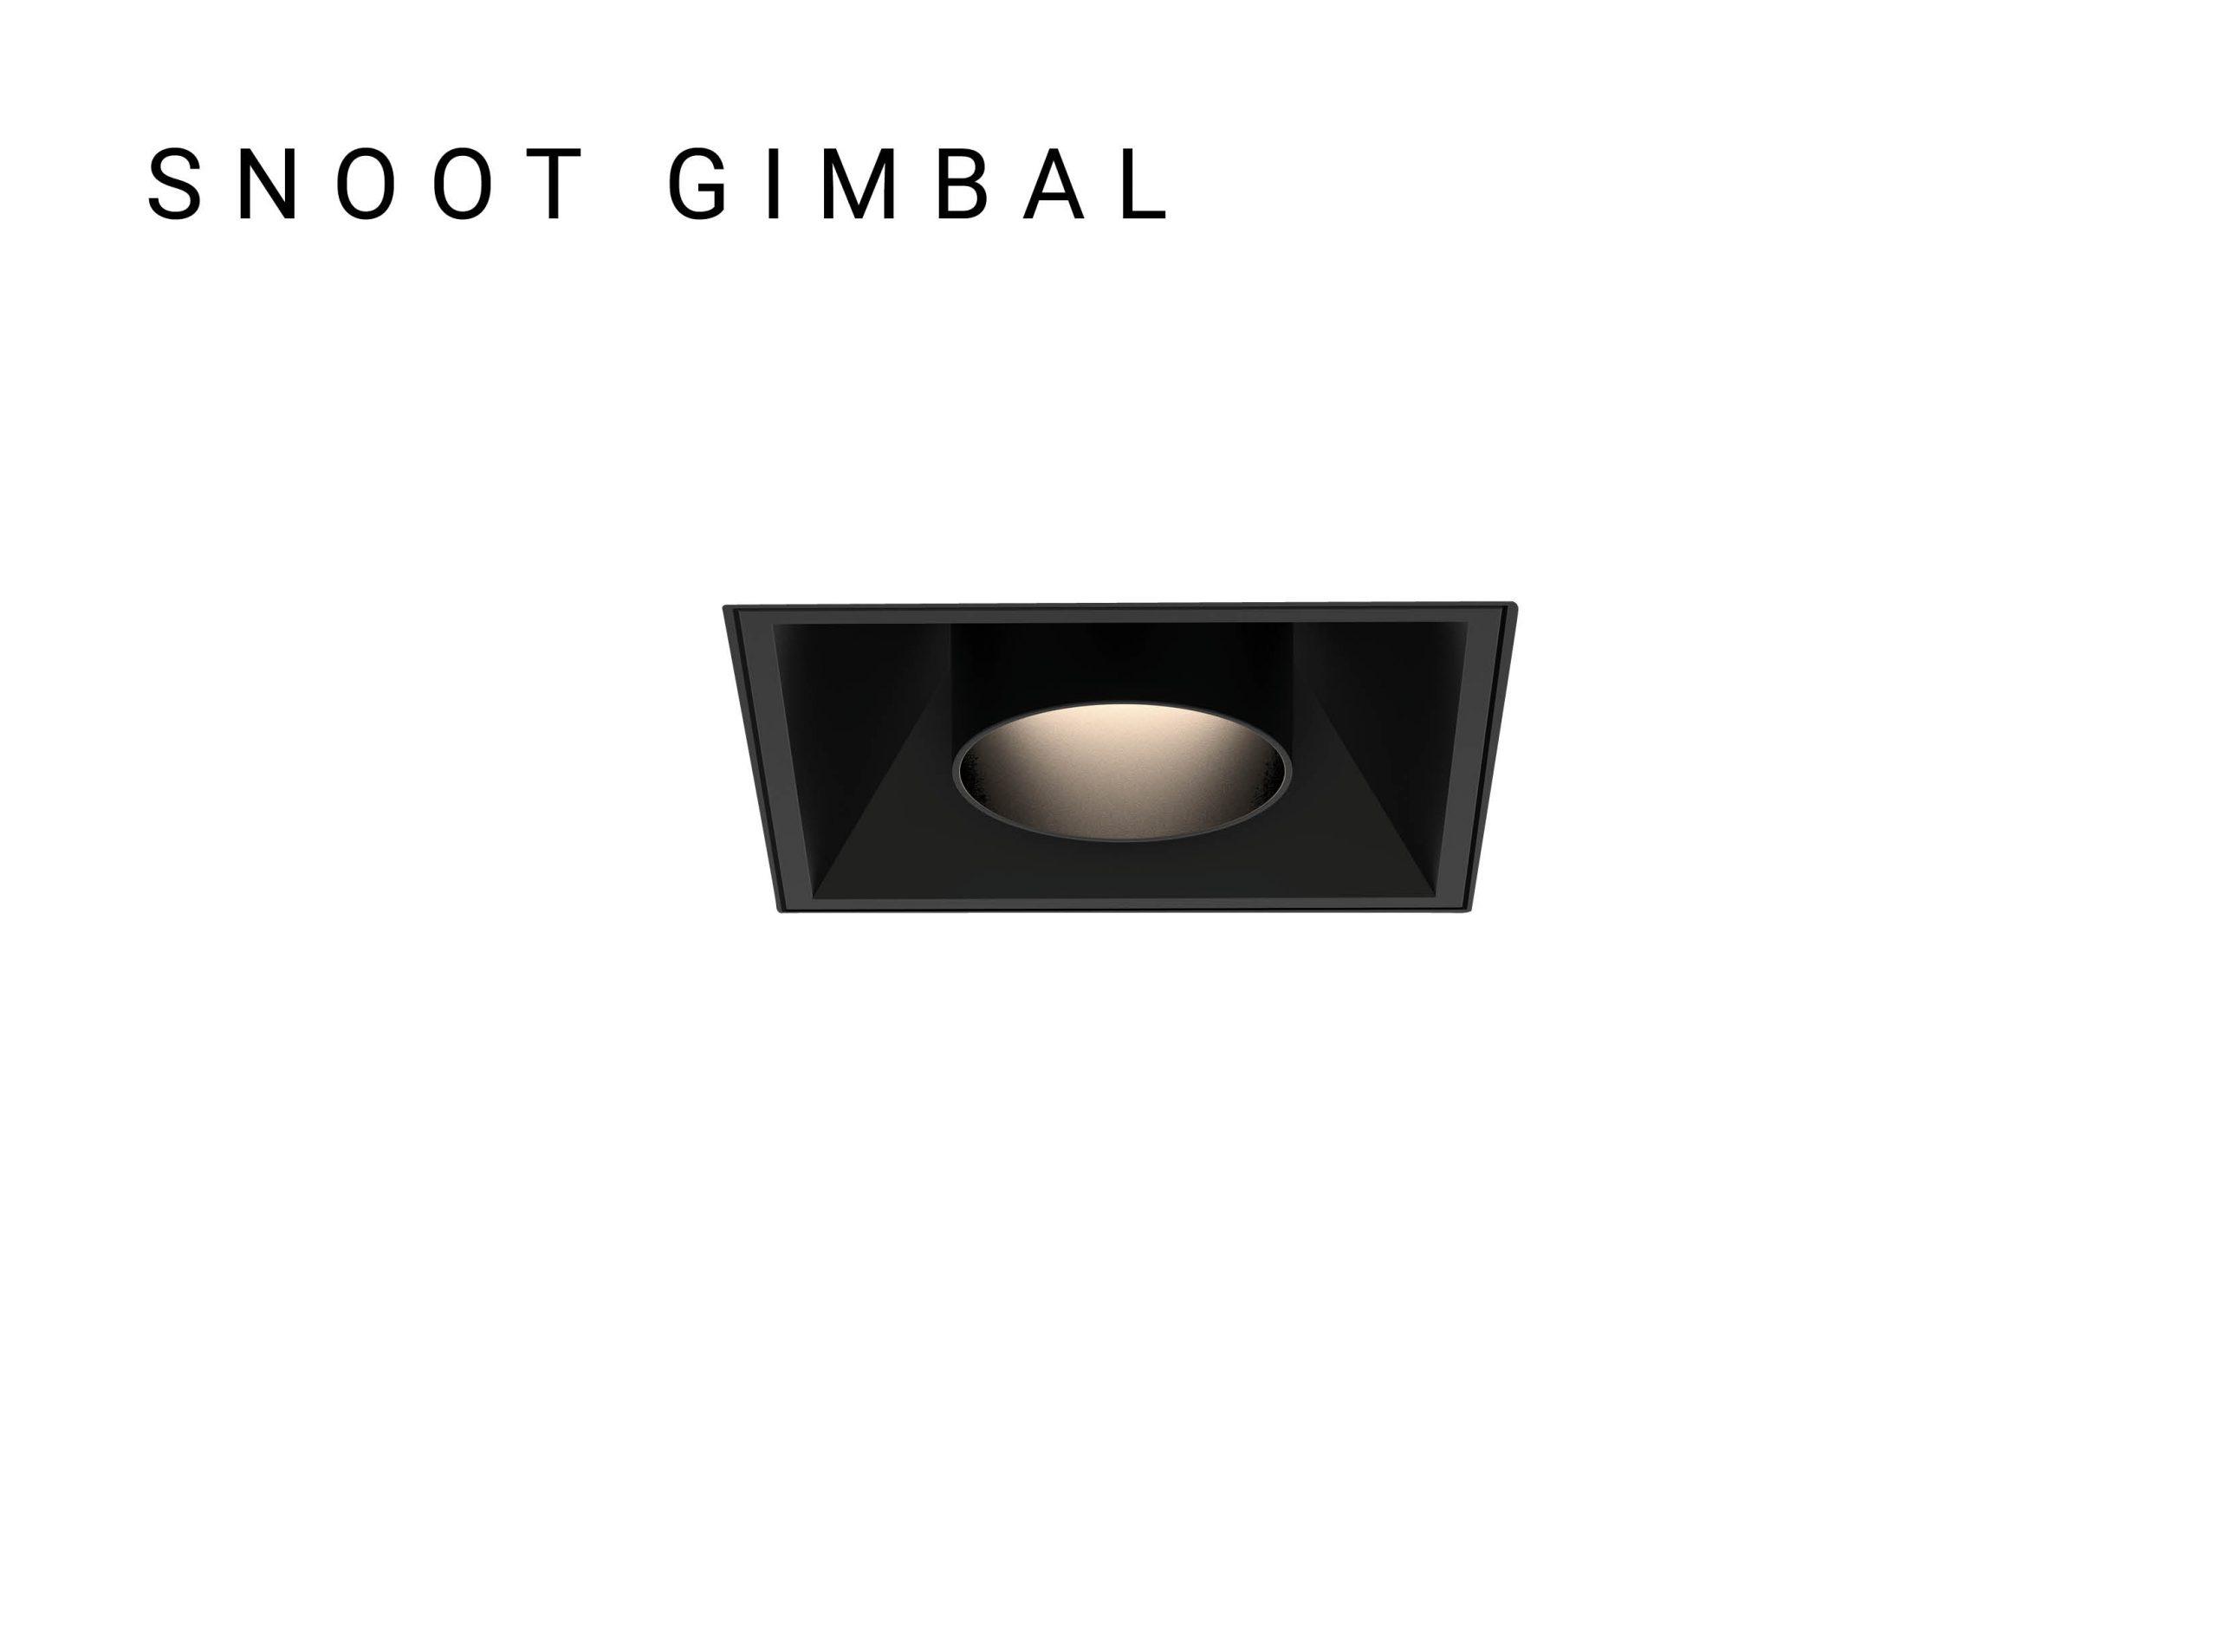 Bravo_SNOOT GIMBAL_Banner_01